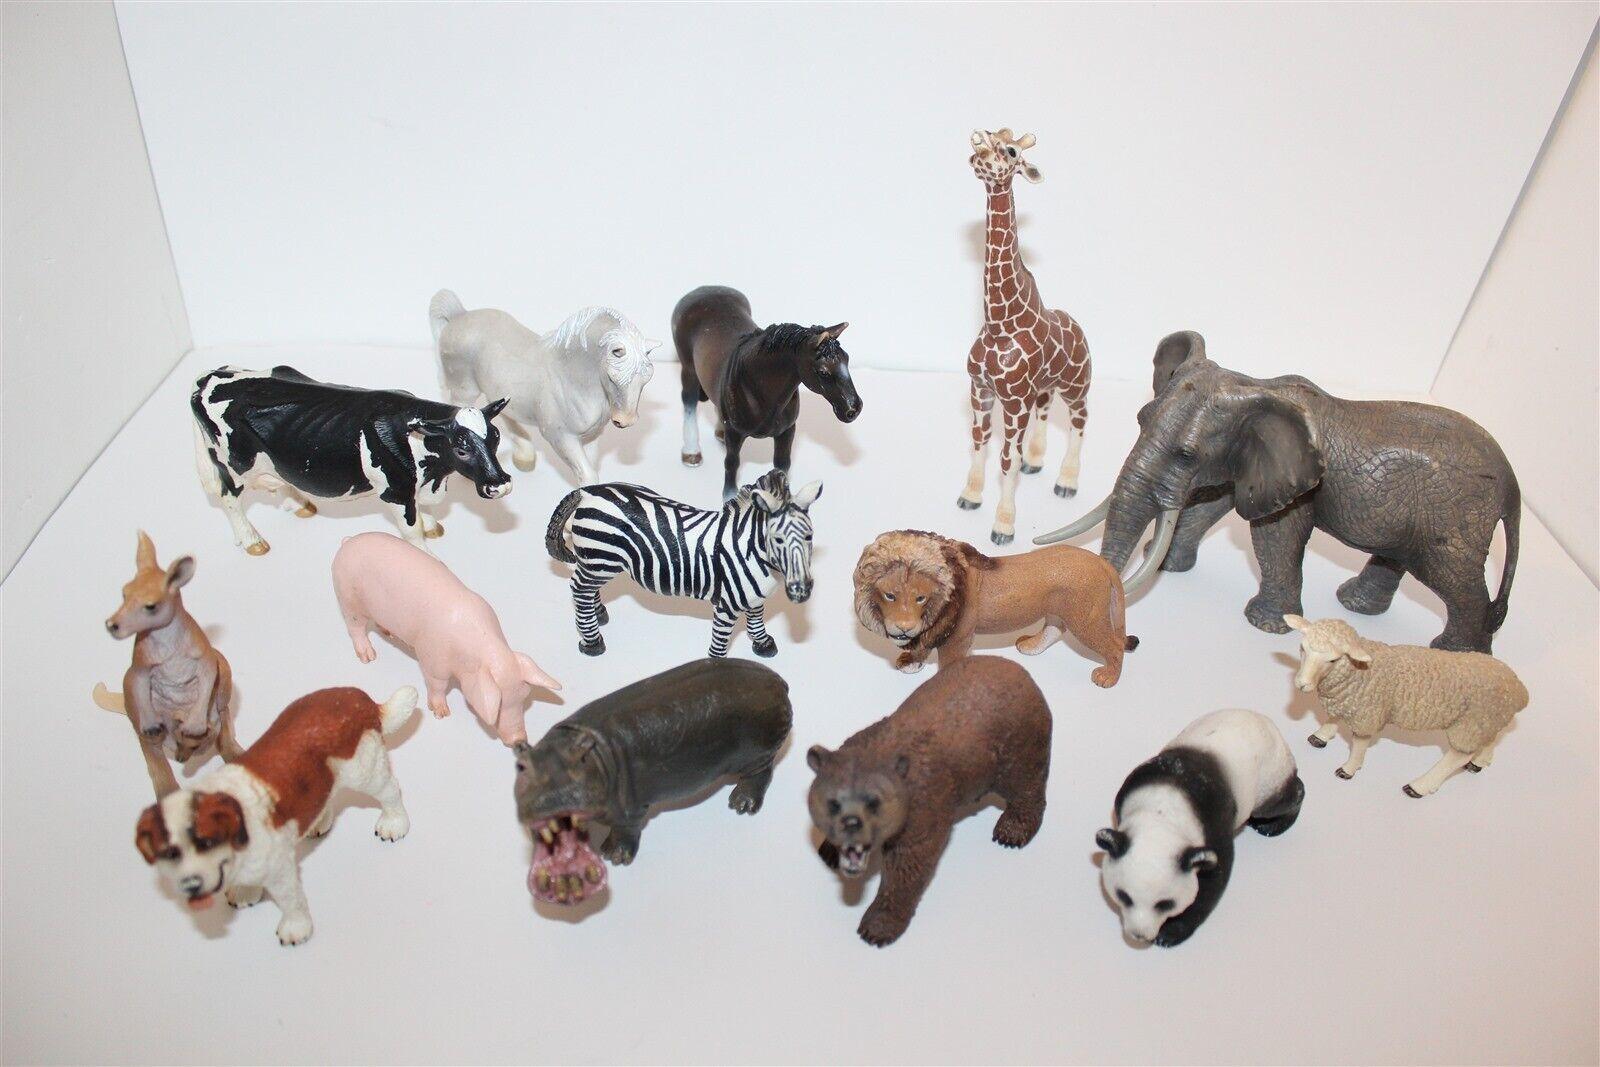 Schleich Bulk Lot Of Animal Figures Elephant Bear Lion Zebra Etc...